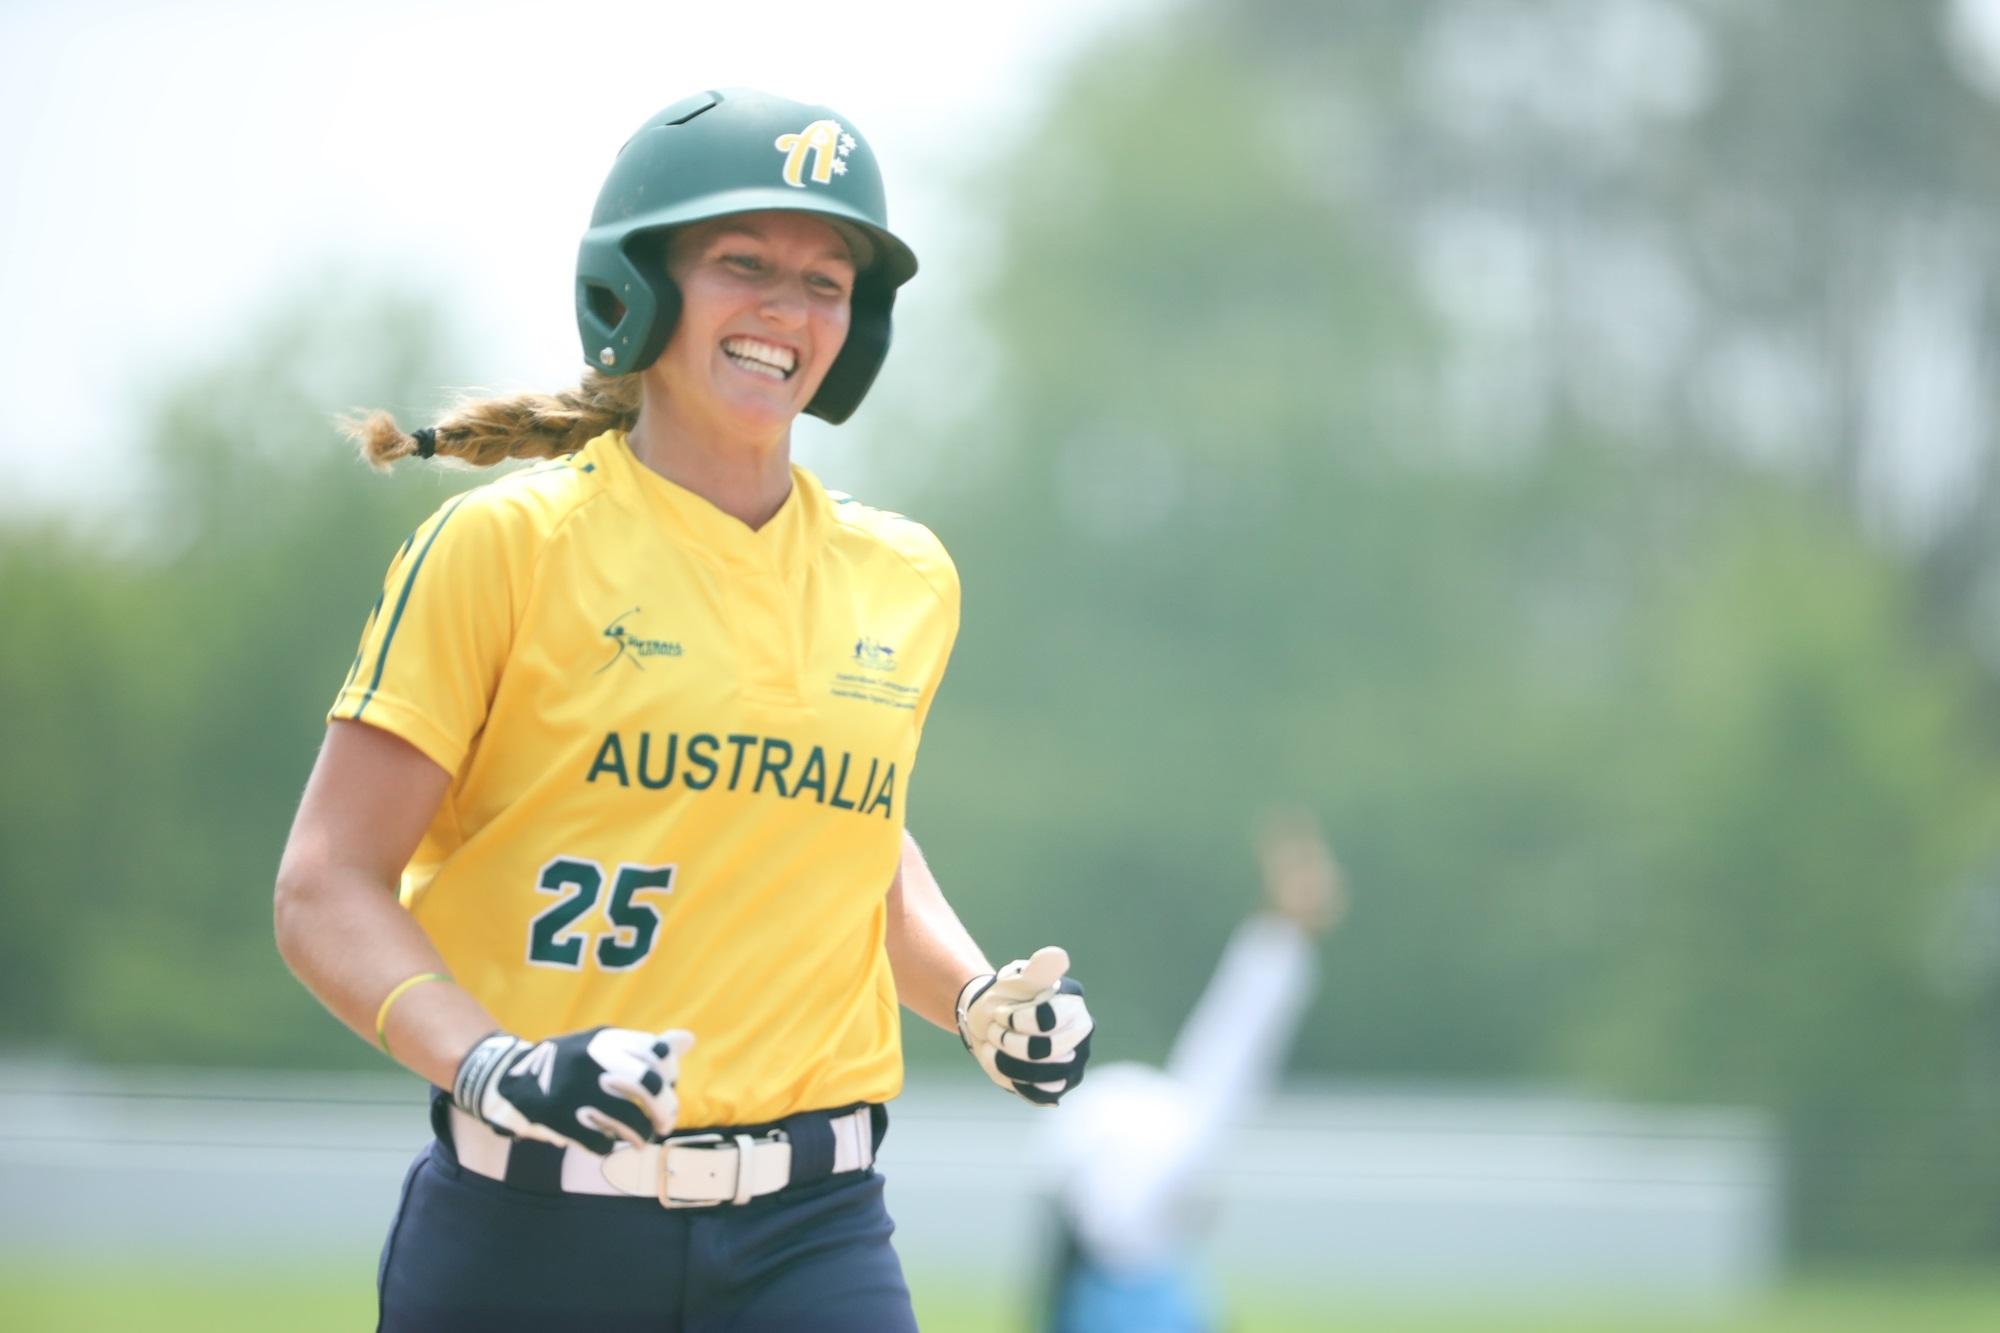 Australia's Chelsea Forkin